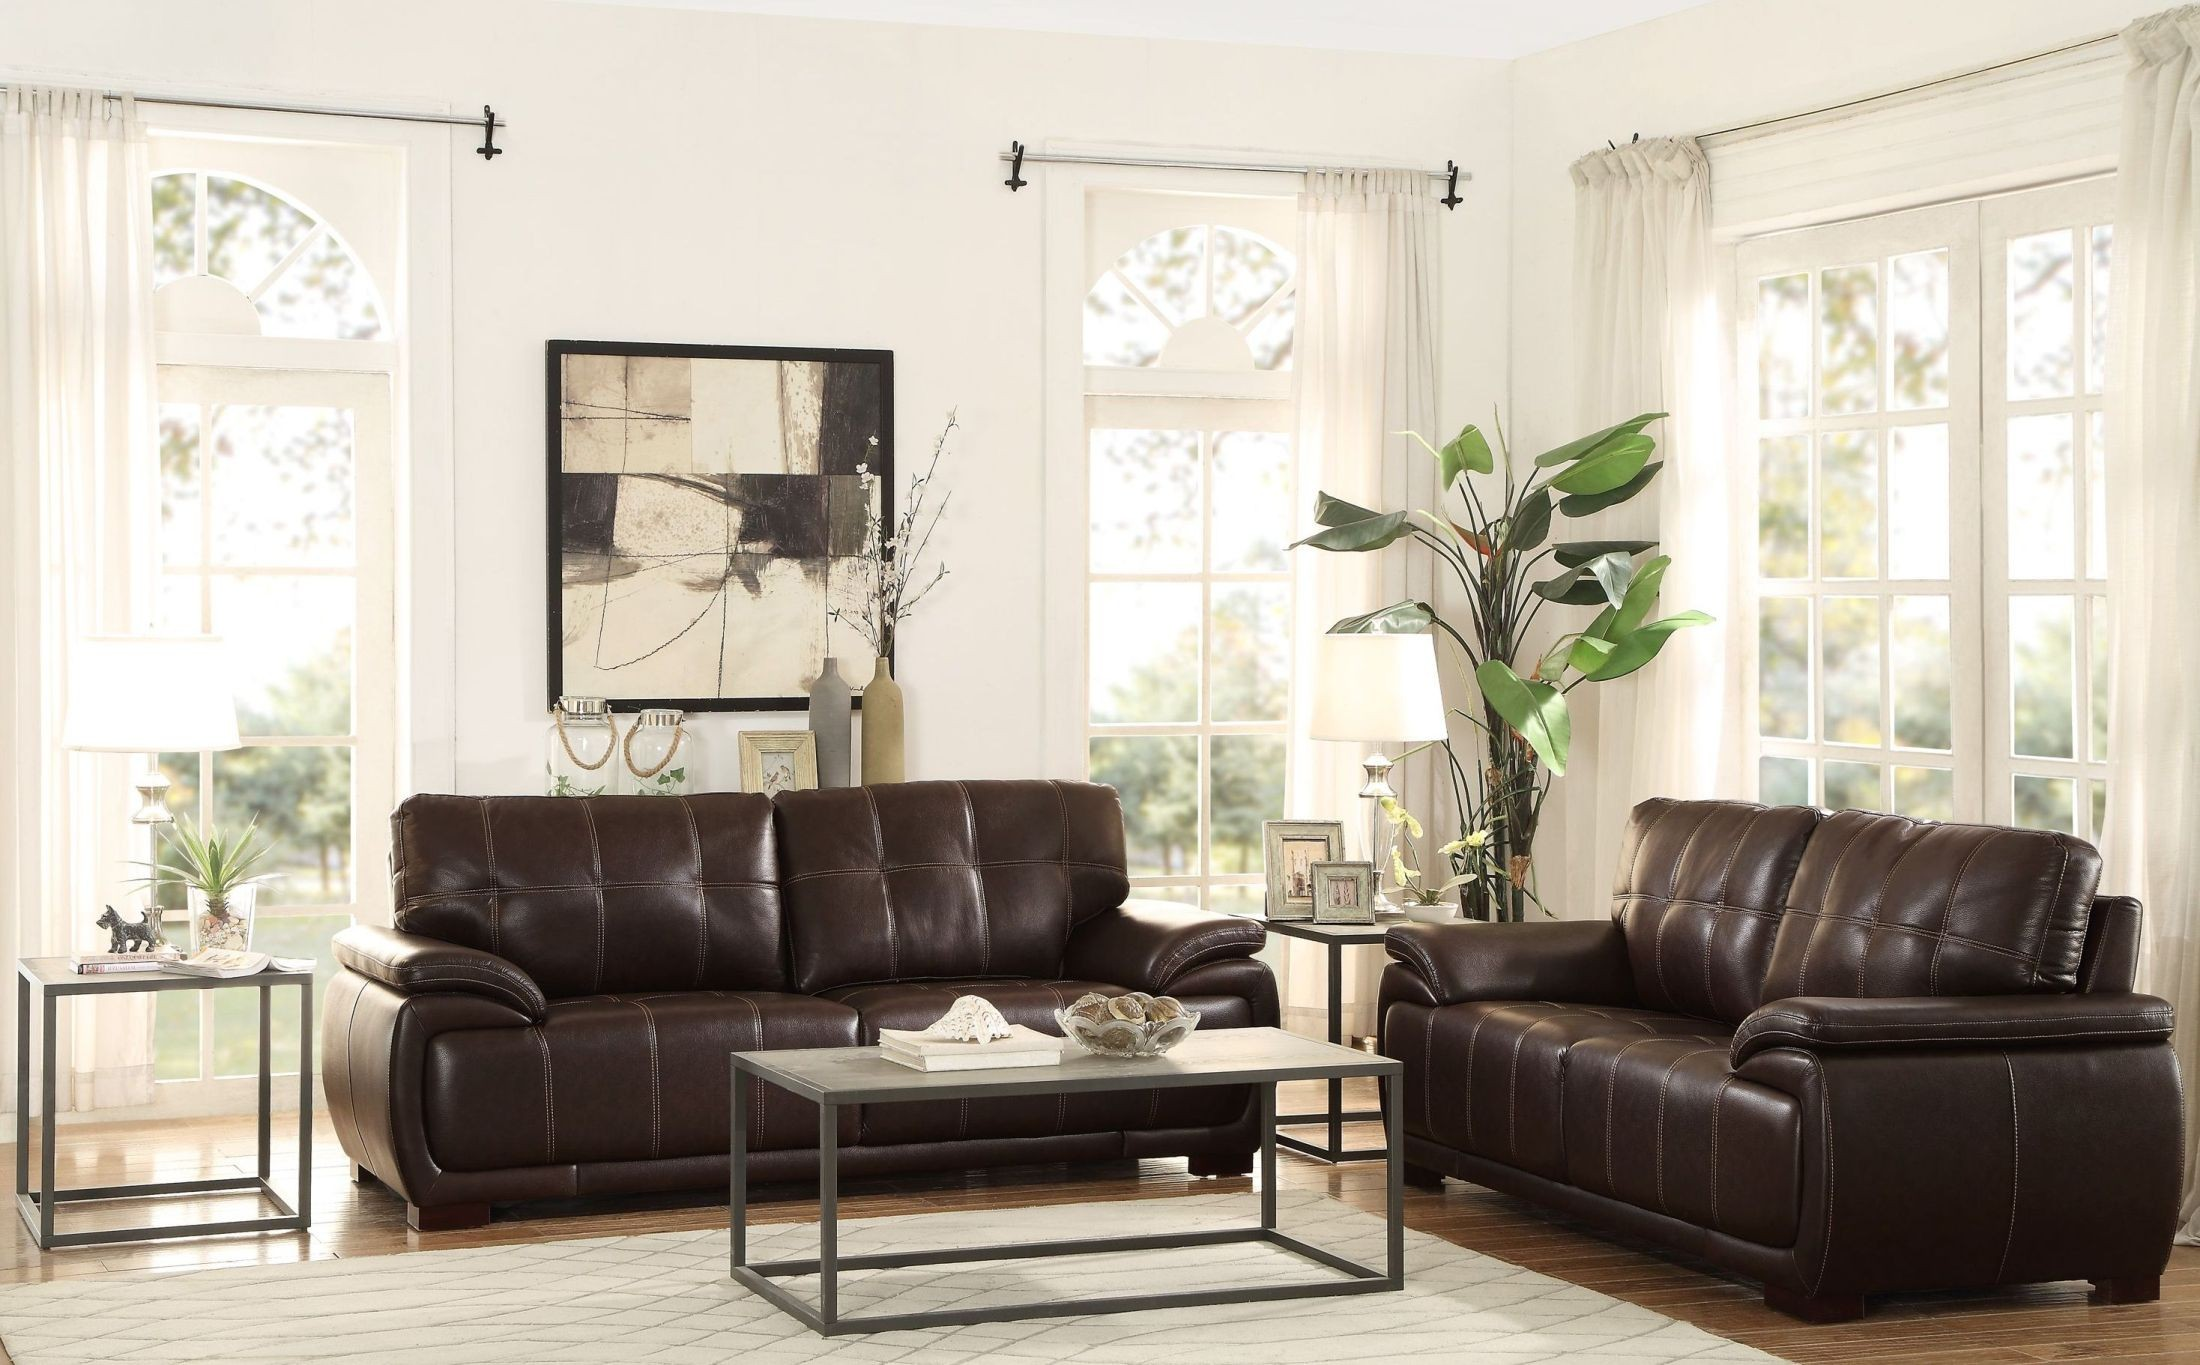 Alpena brown living room set from homelegance coleman for Brown living room set